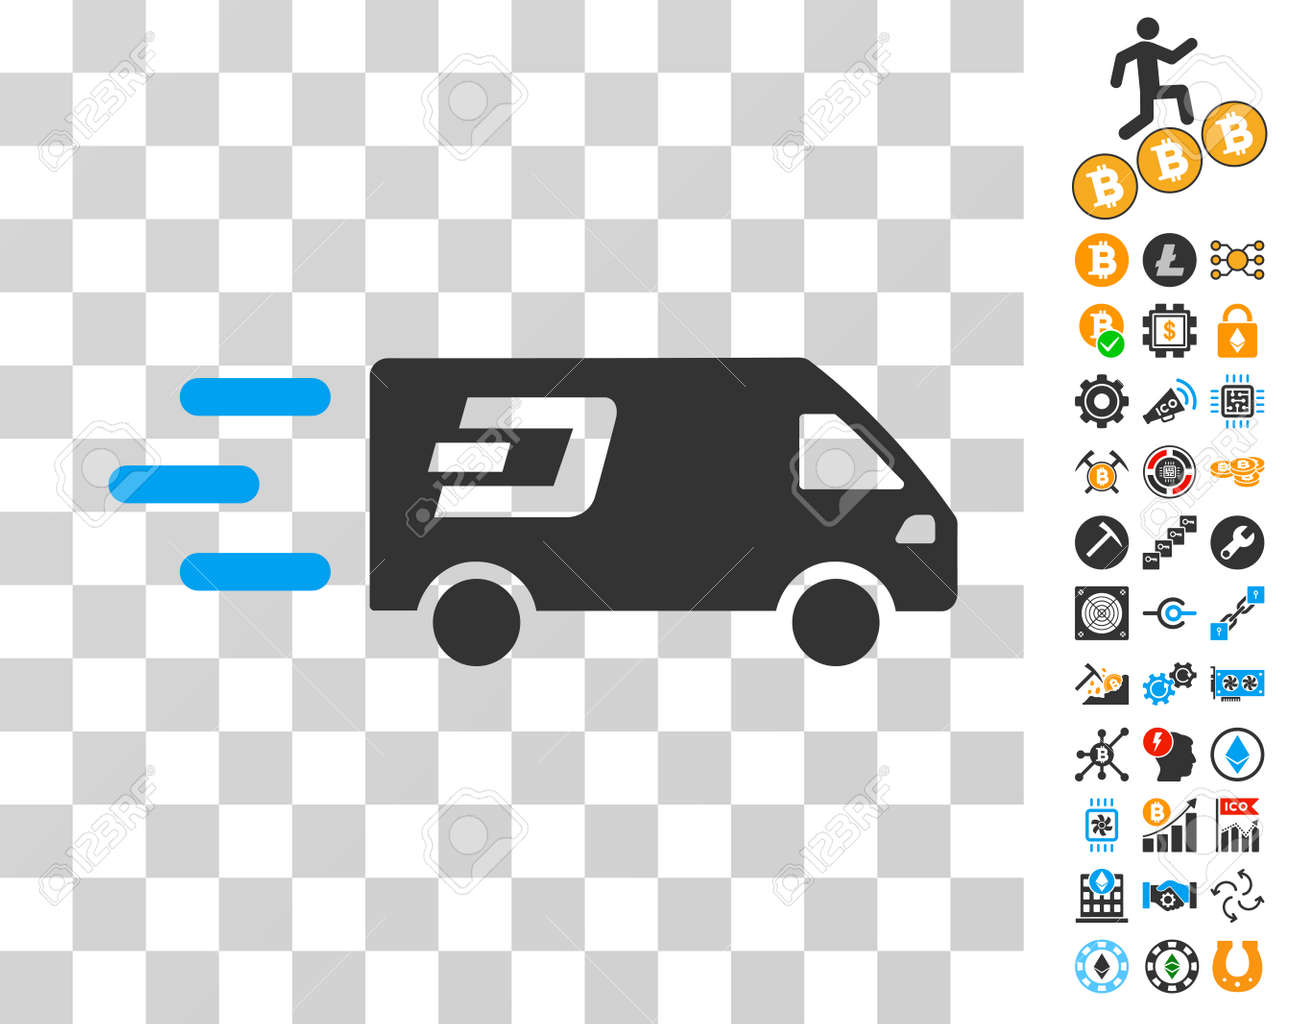 Fast Dash Delivery Car icon with bonus bitcoin mining and blockchain